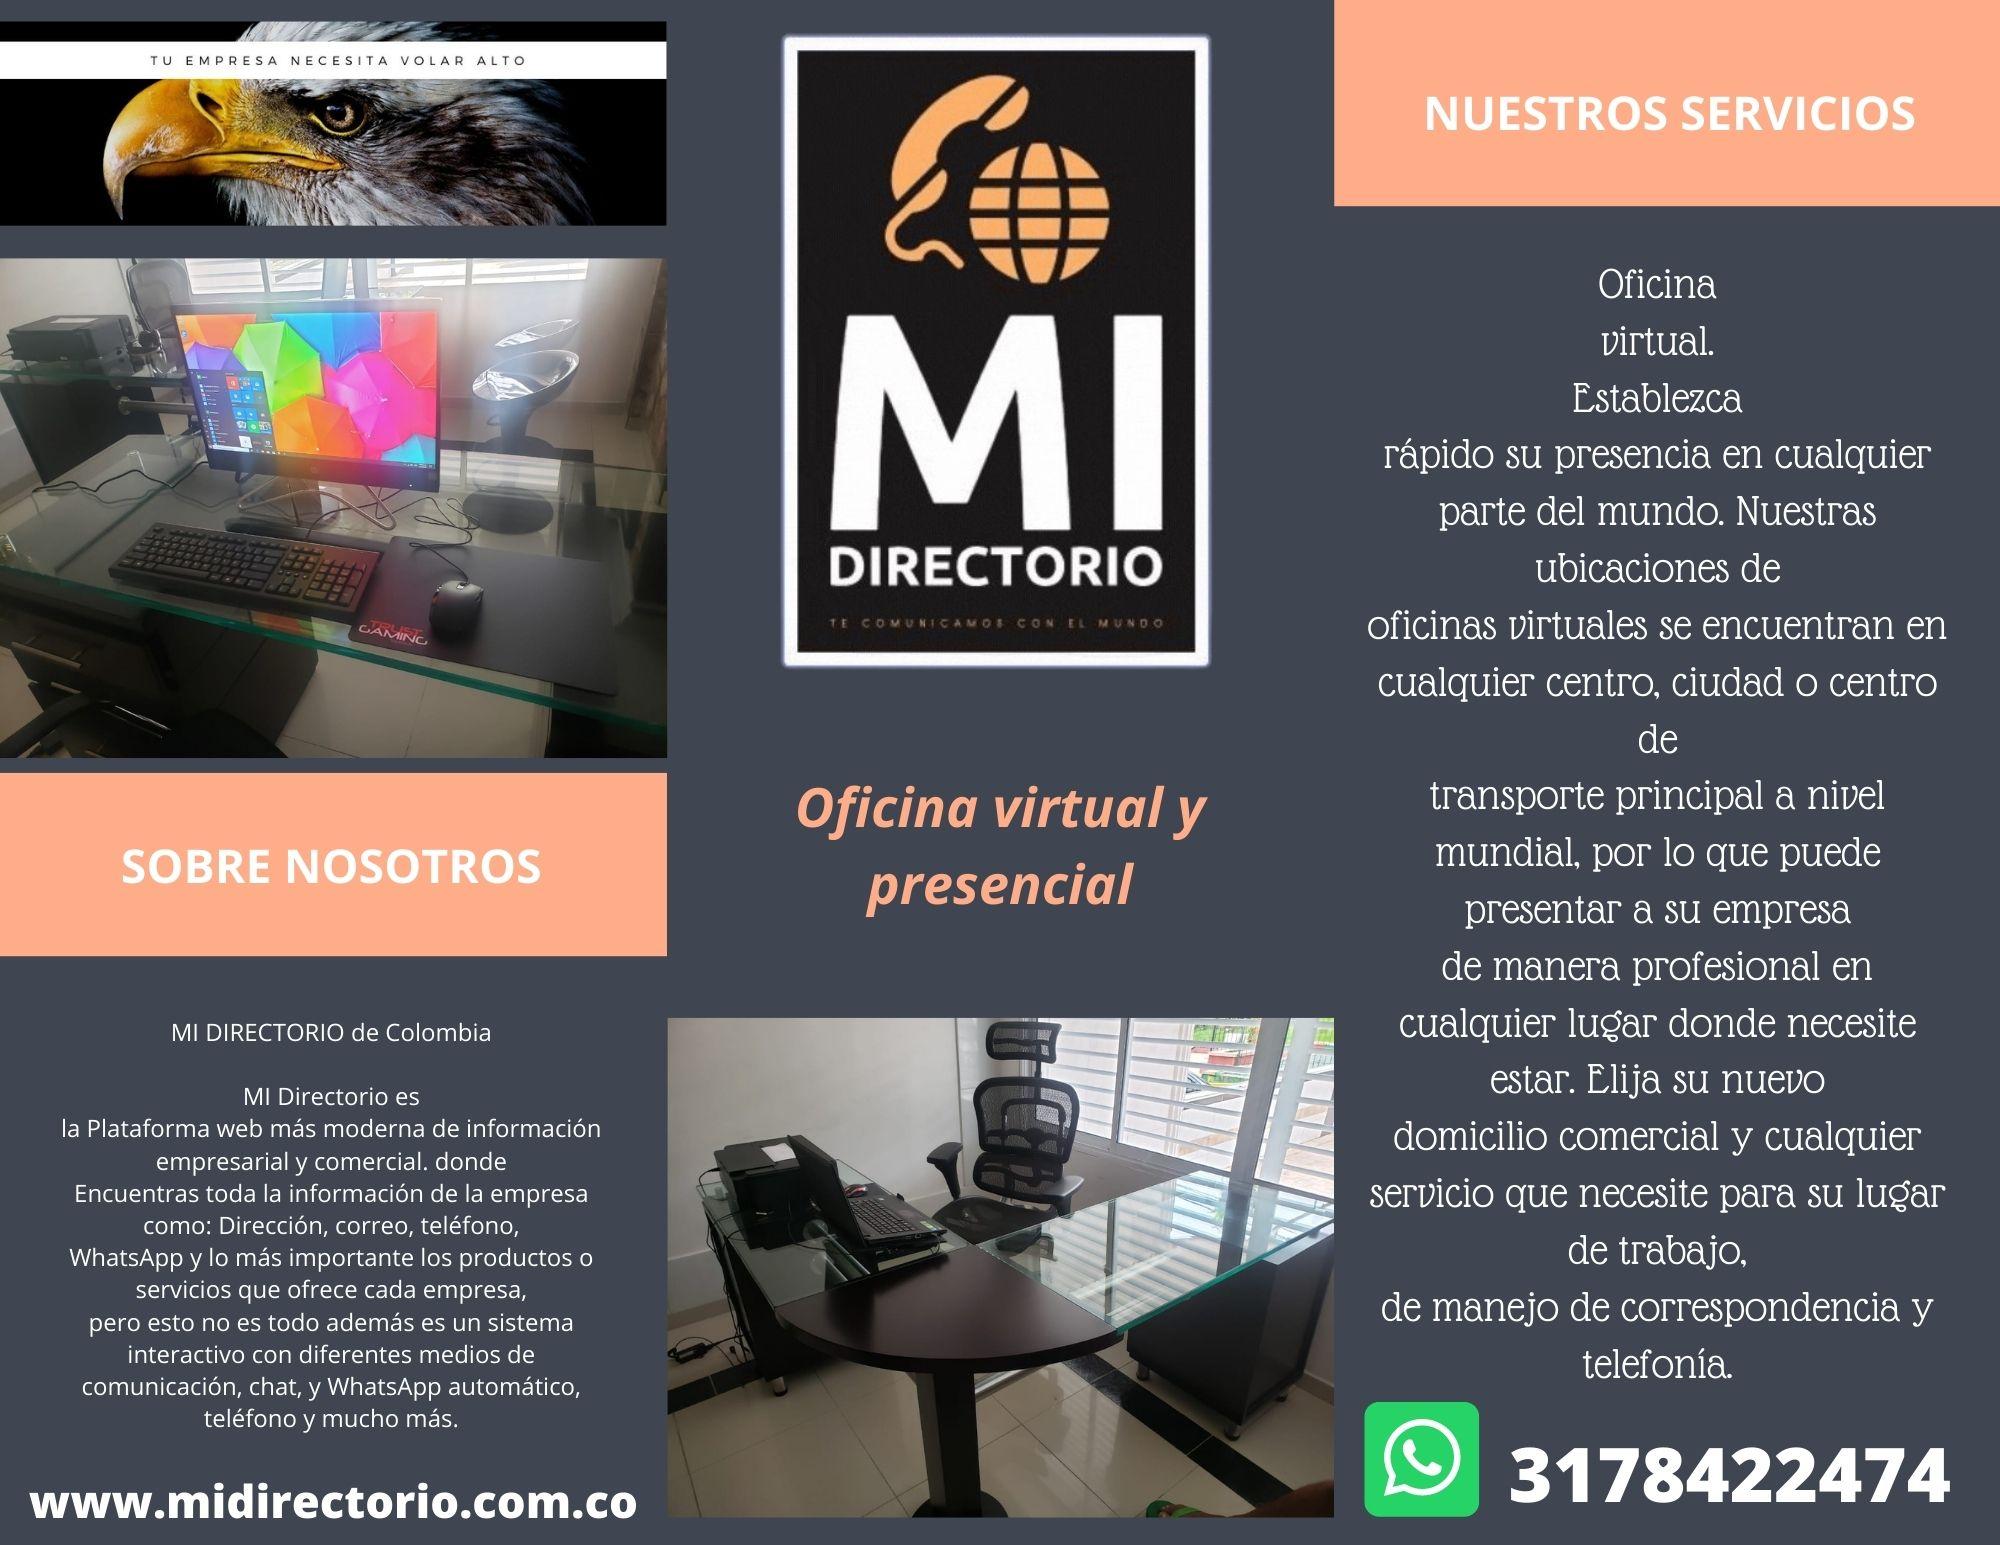 oficina virtual buenaventura (2)